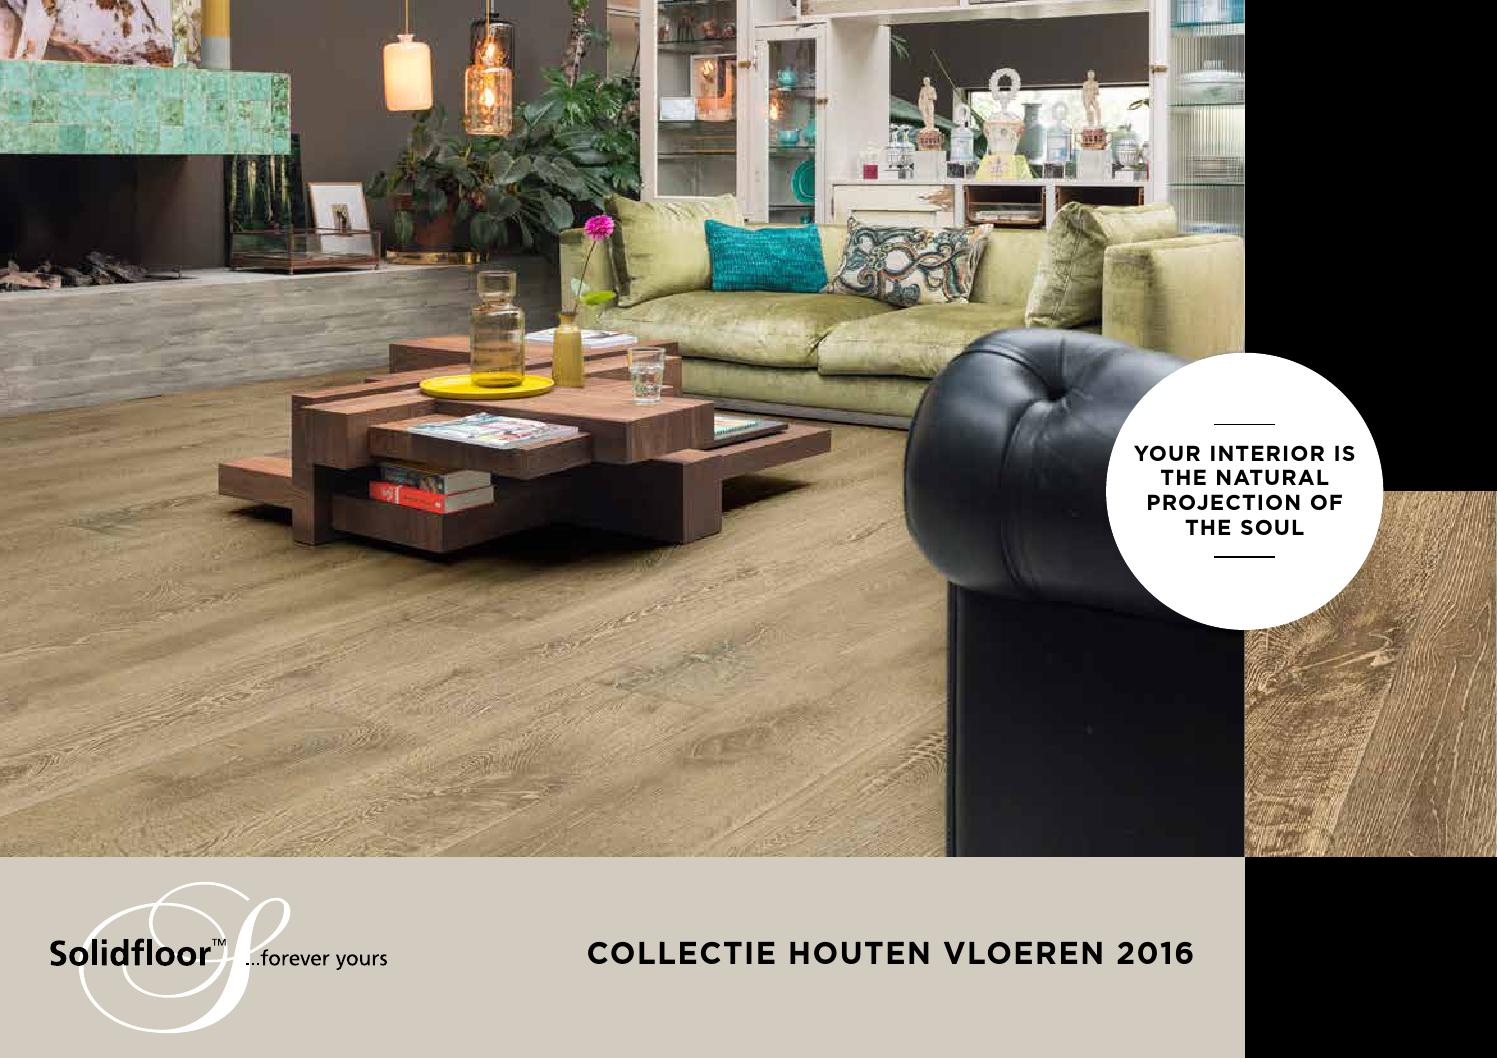 Quickstep laminaat brochure 2014 by Vonk & Vloer - issuu